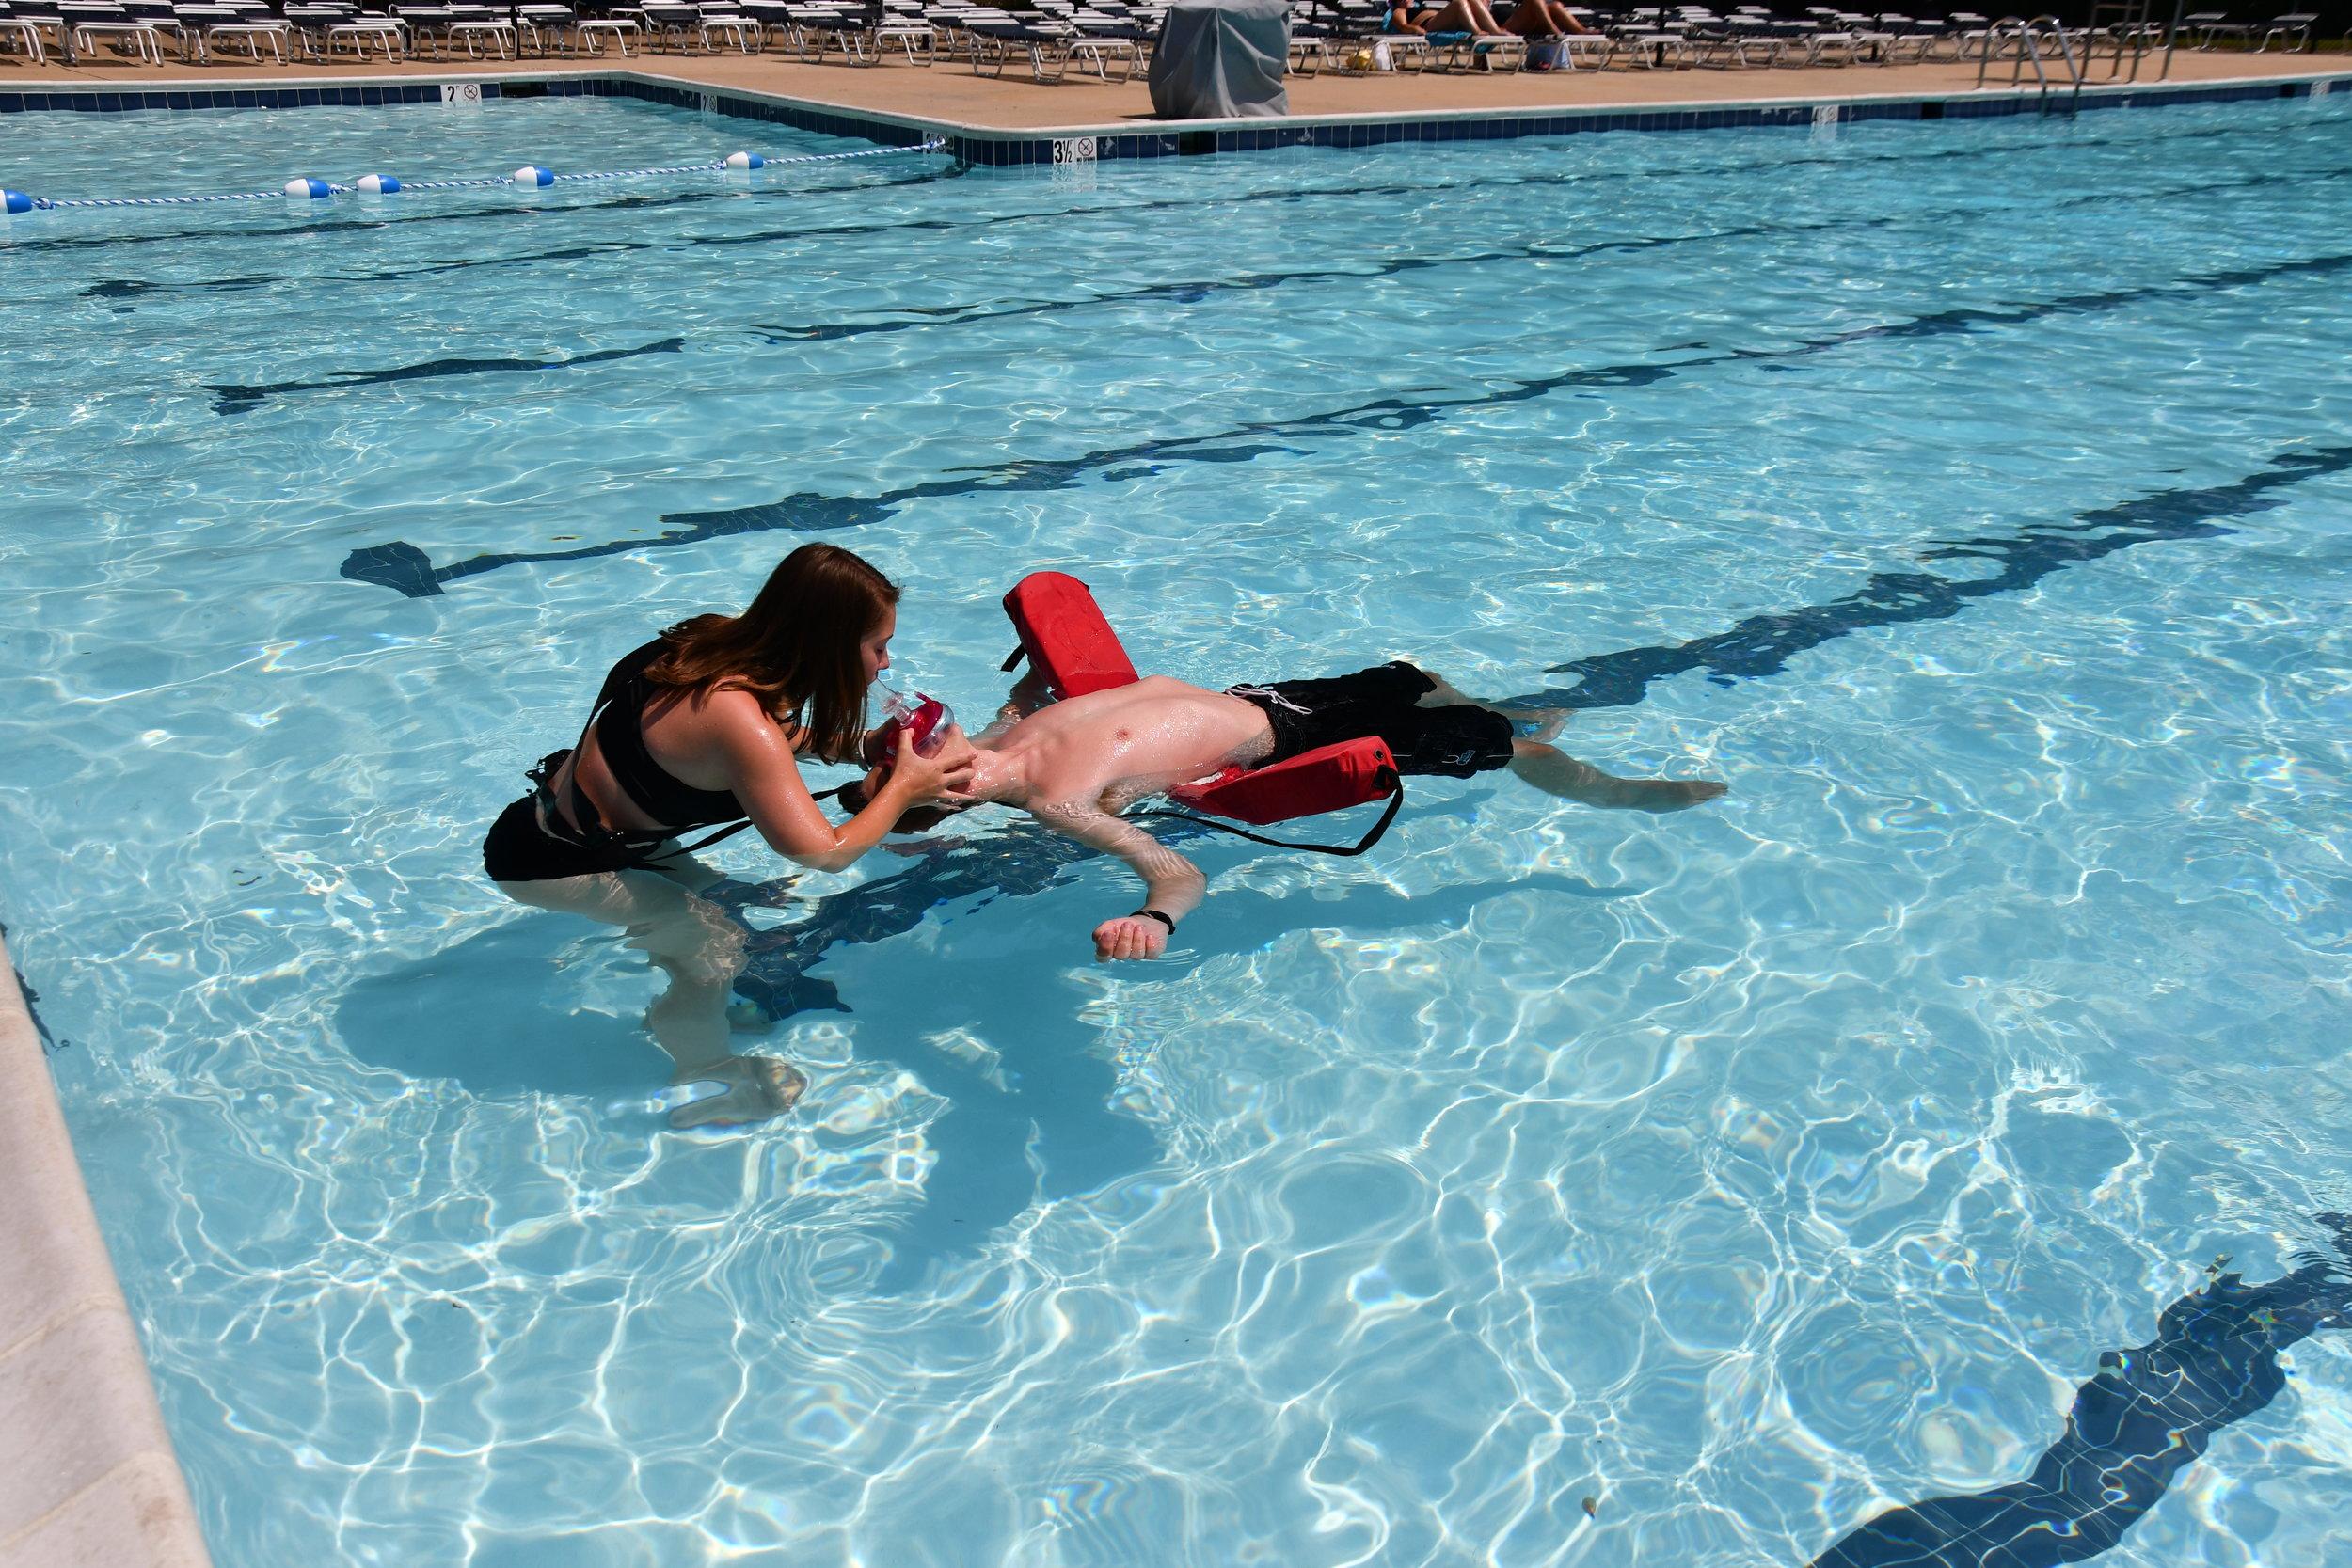 Lifeguards practicing their skills.